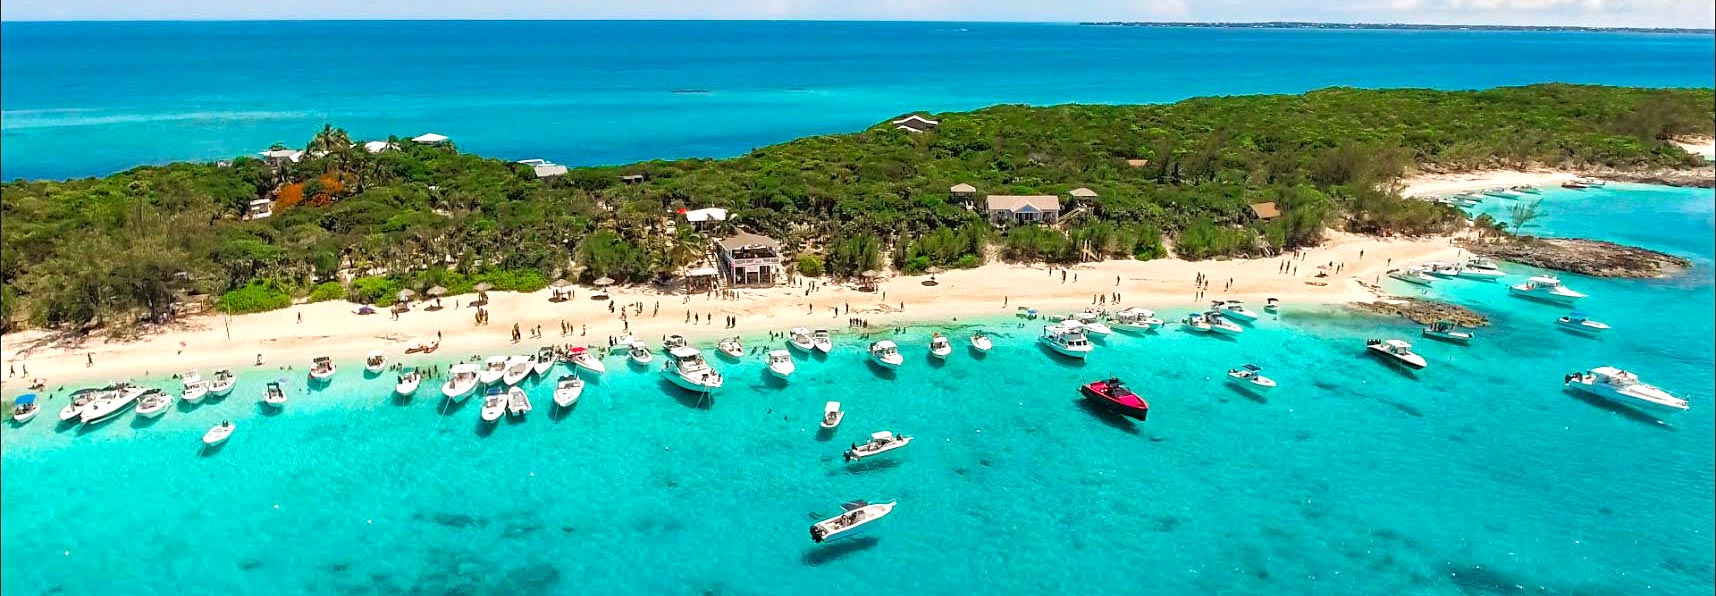 rose island bahamas sandy toes